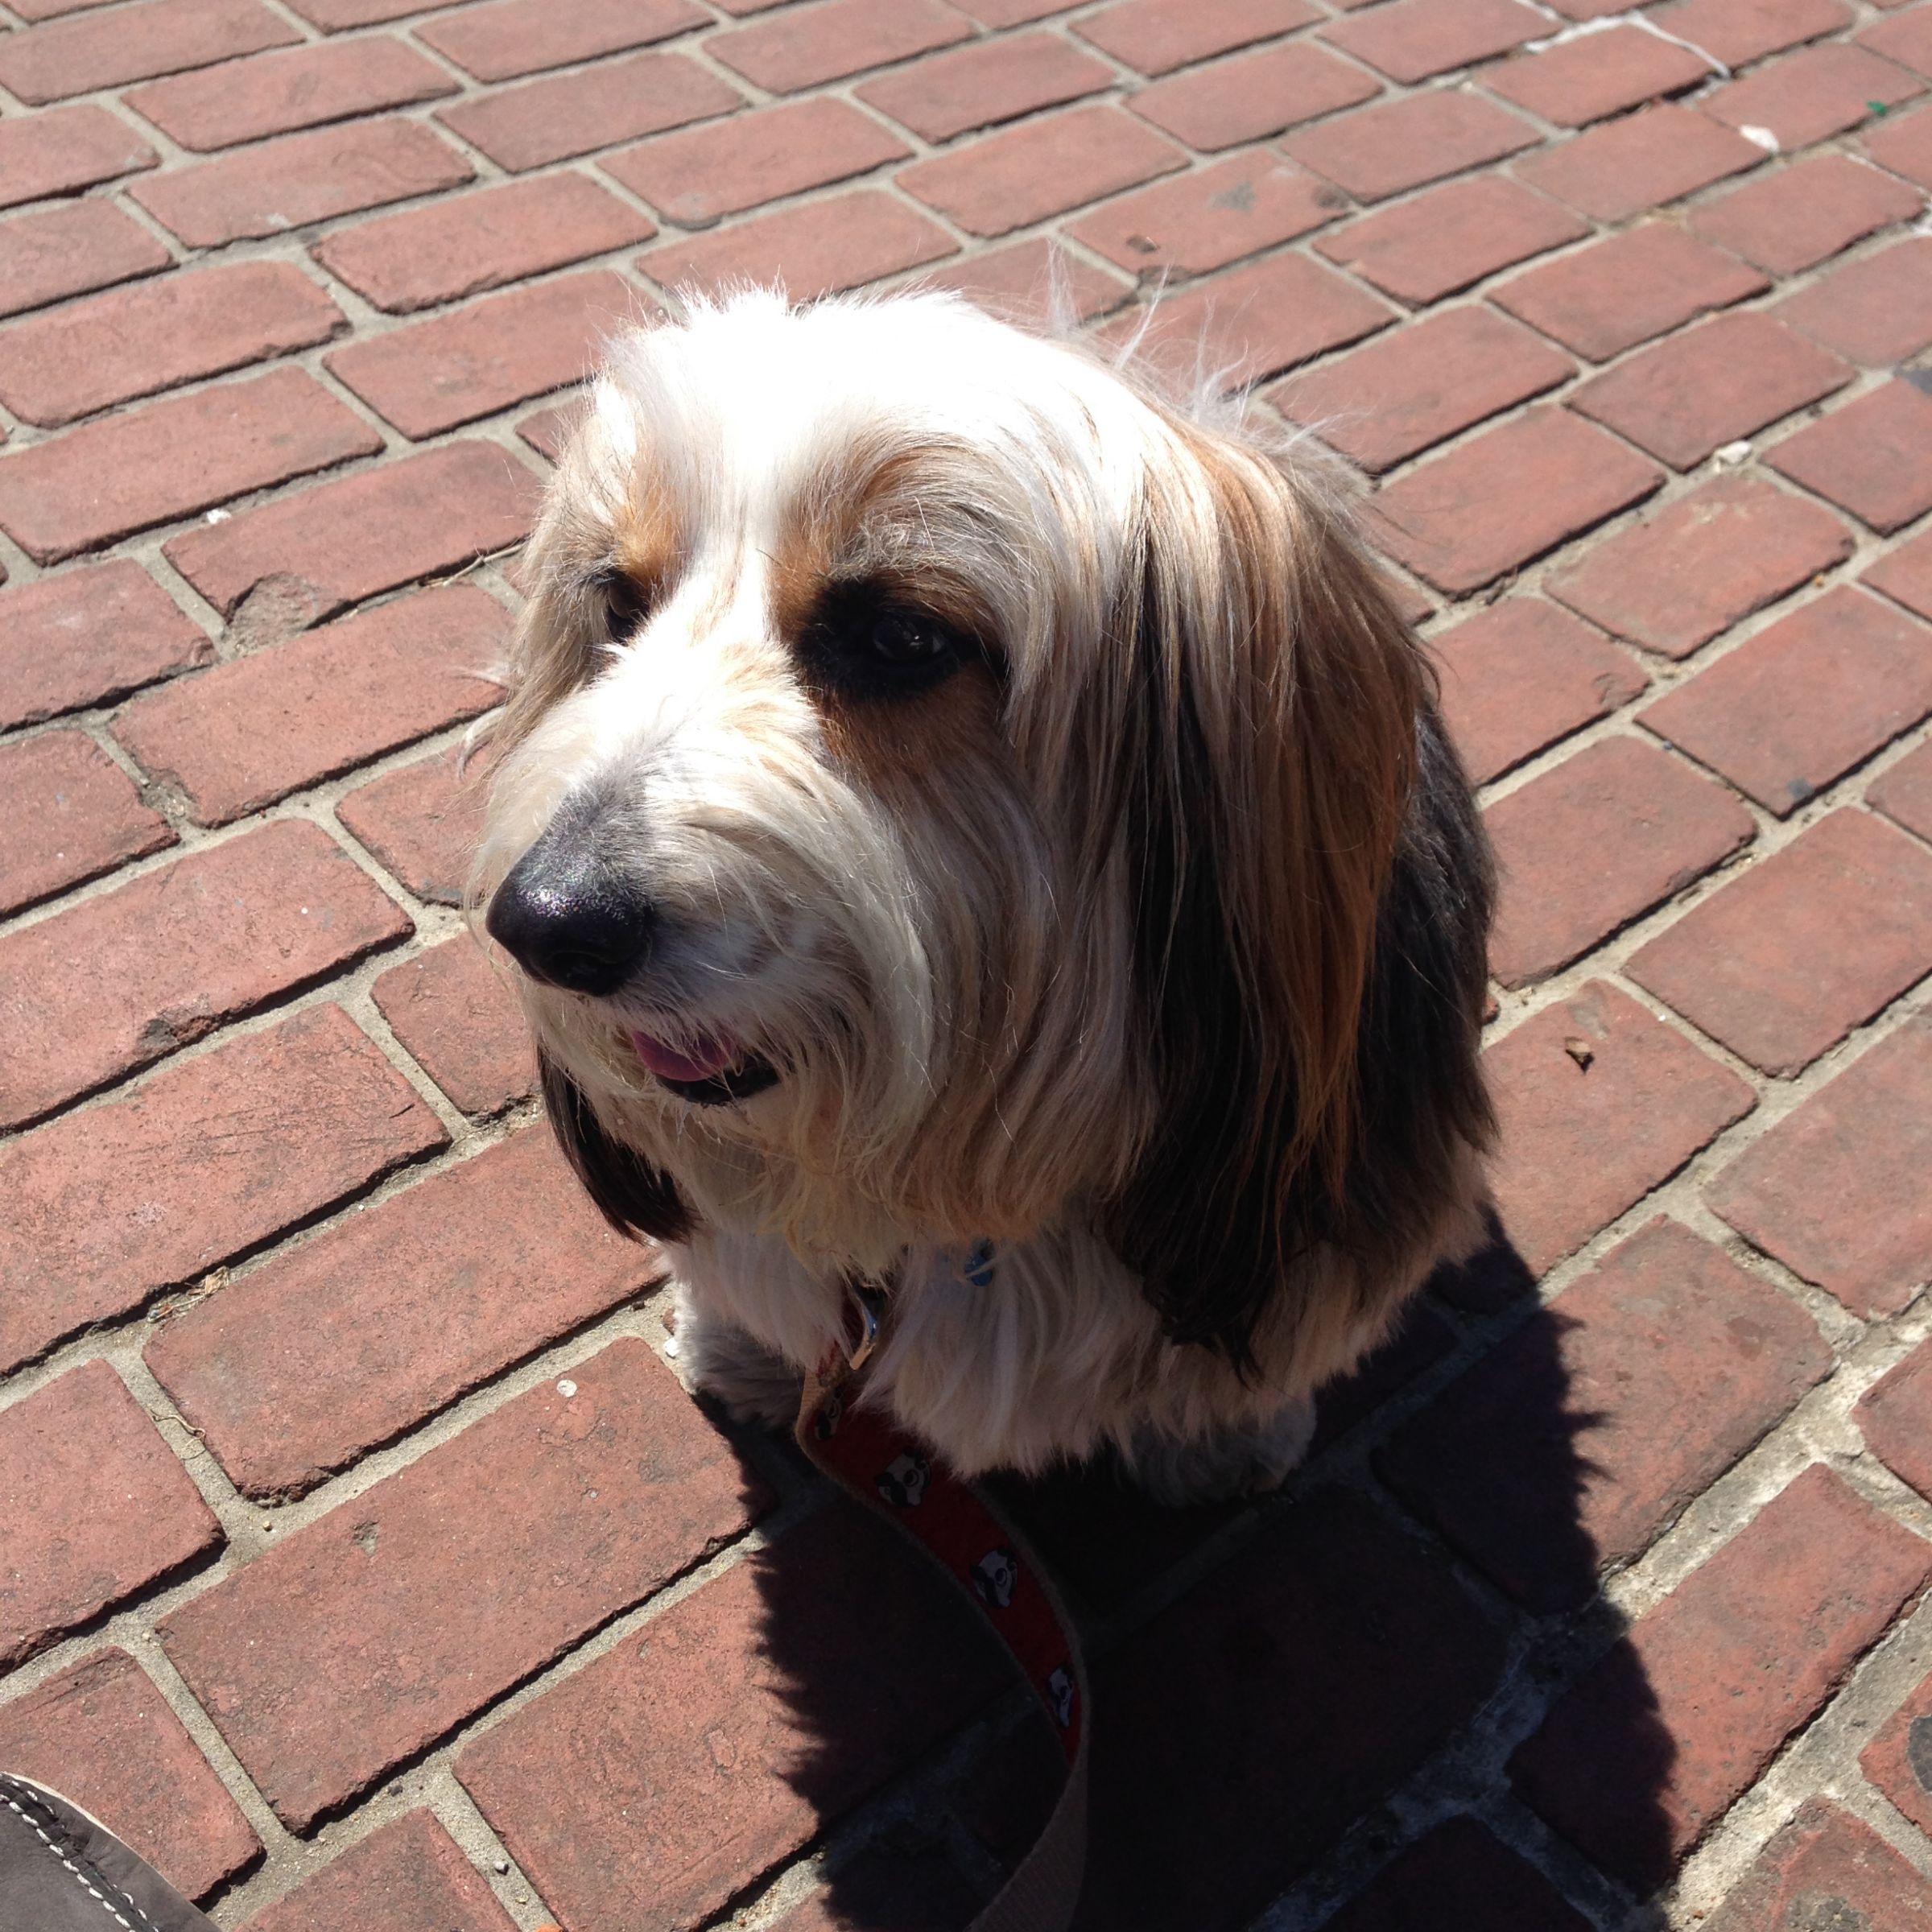 Petit basset griffon vendeen information dog breeds at dogthelove - Petit basset hound angers ...